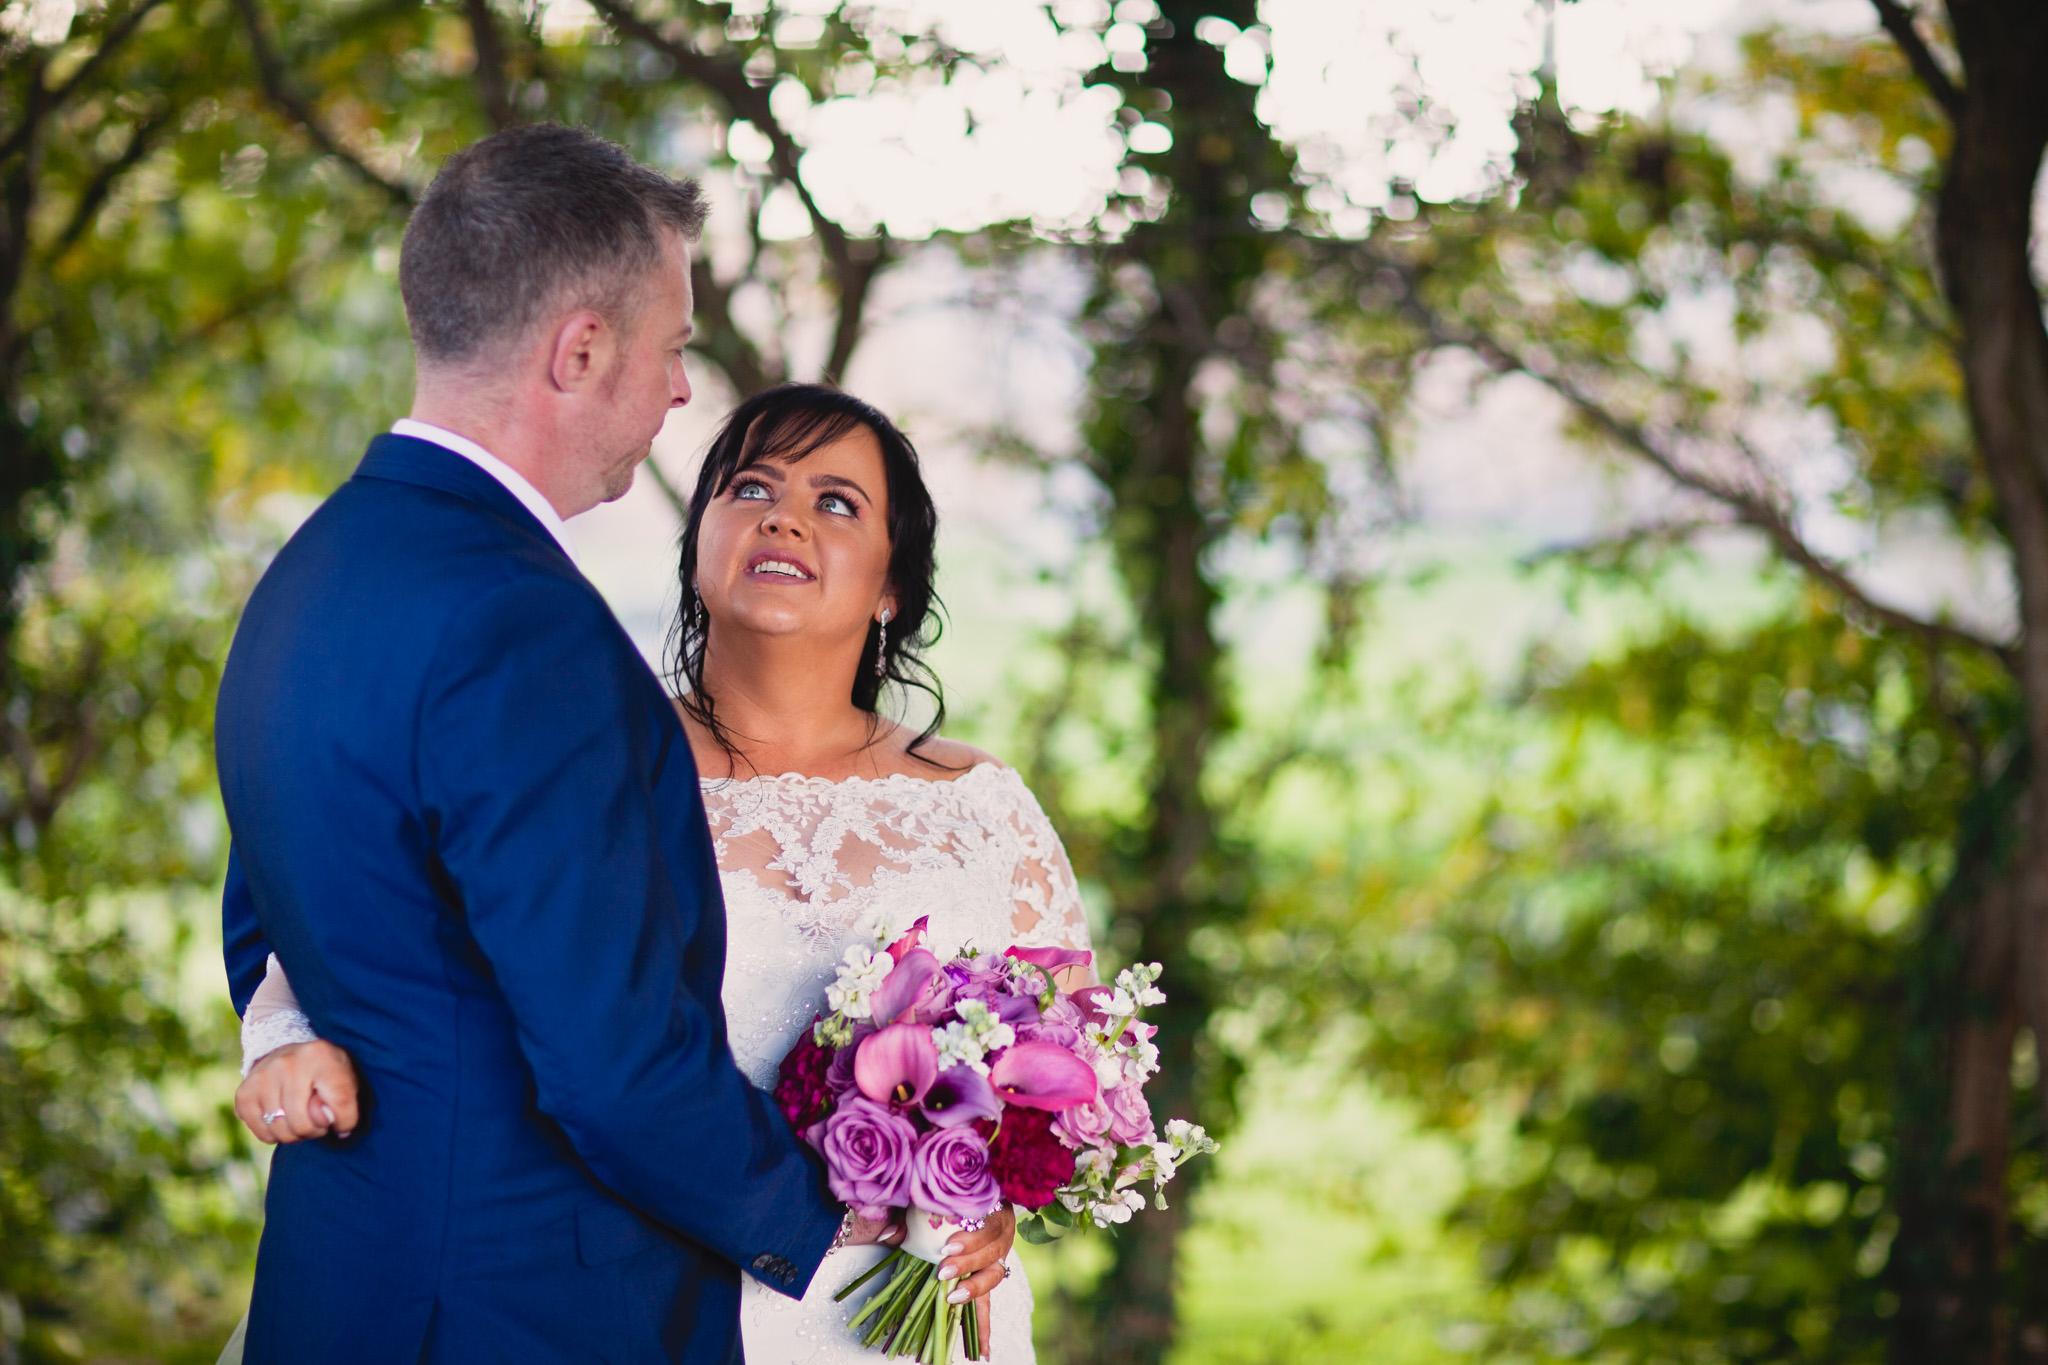 Mark_Barnes_Northern_Ireland_Wedding_Photography_Marine_hotel_ballycastle_Wedding_Photography_Janet&Darren-18.jpg